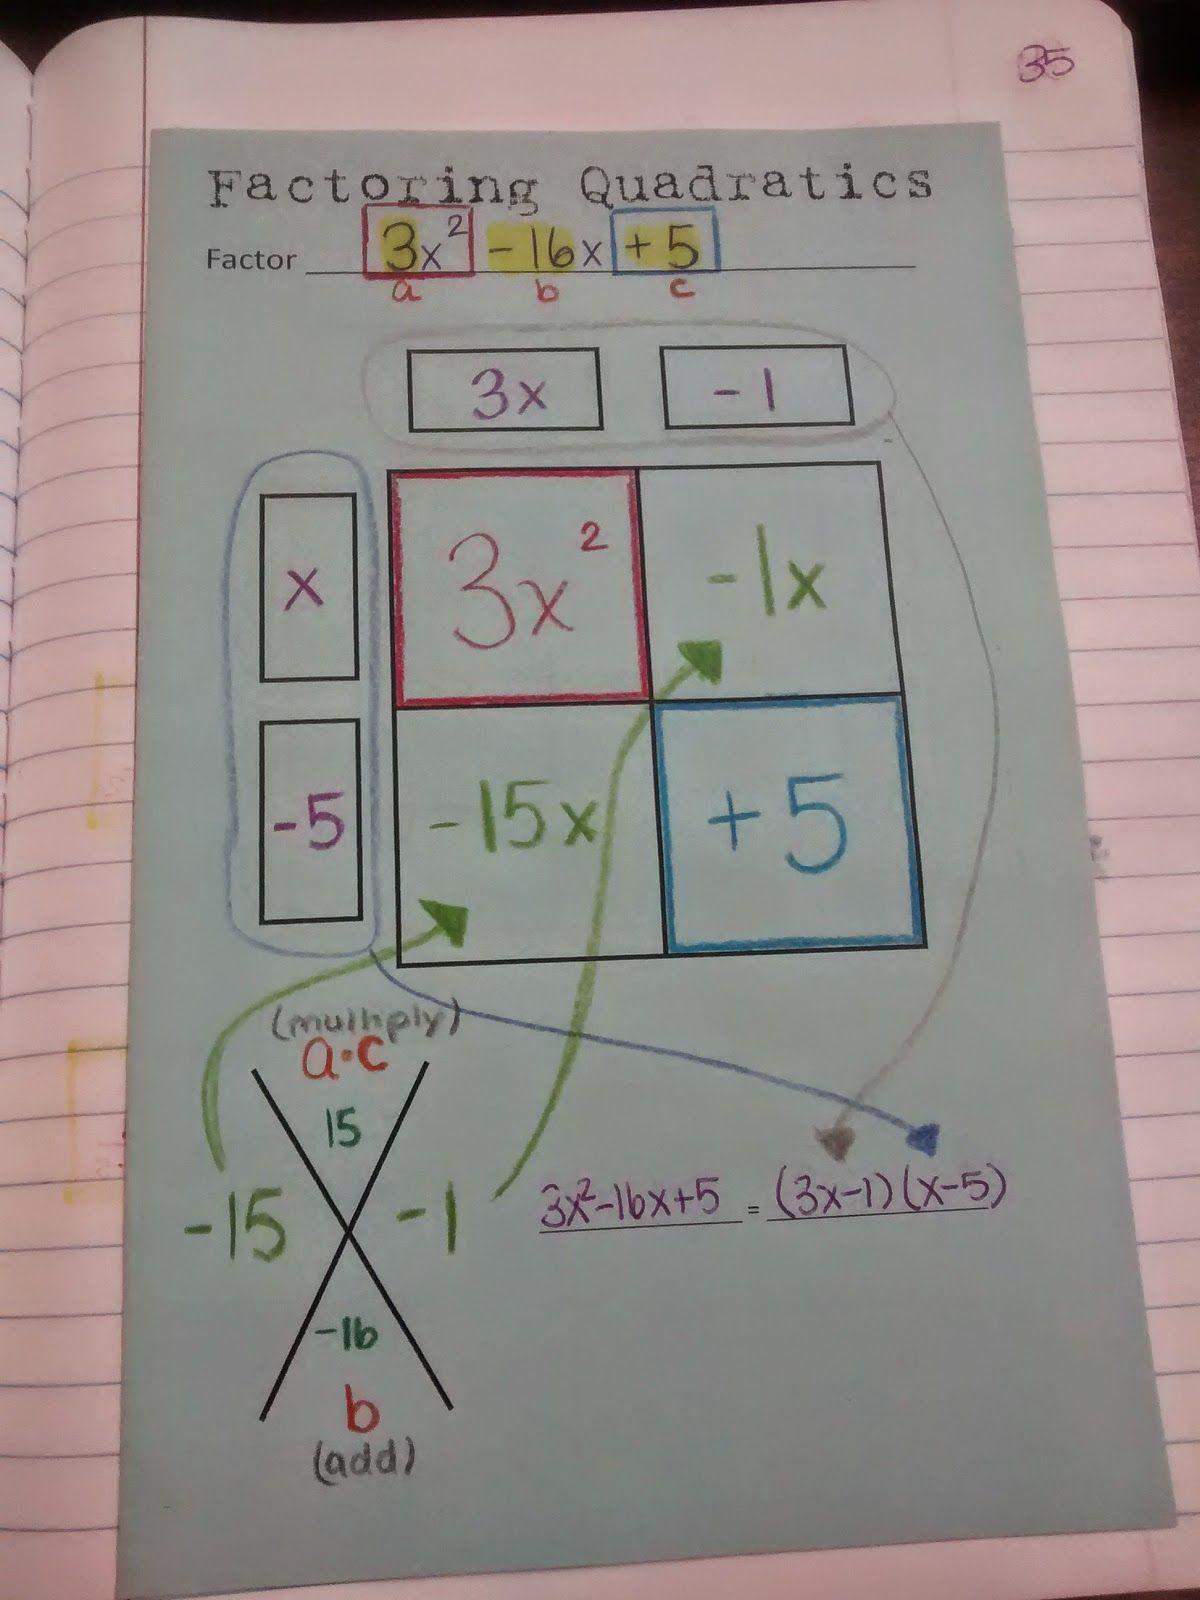 Unit 2 In Algebra 2 Was A Huge One Next Year I Will Definitely Break This Into Tinier Units For My Sanity L Factoring Quadratics Quadratics School Algebra [ 1600 x 1200 Pixel ]